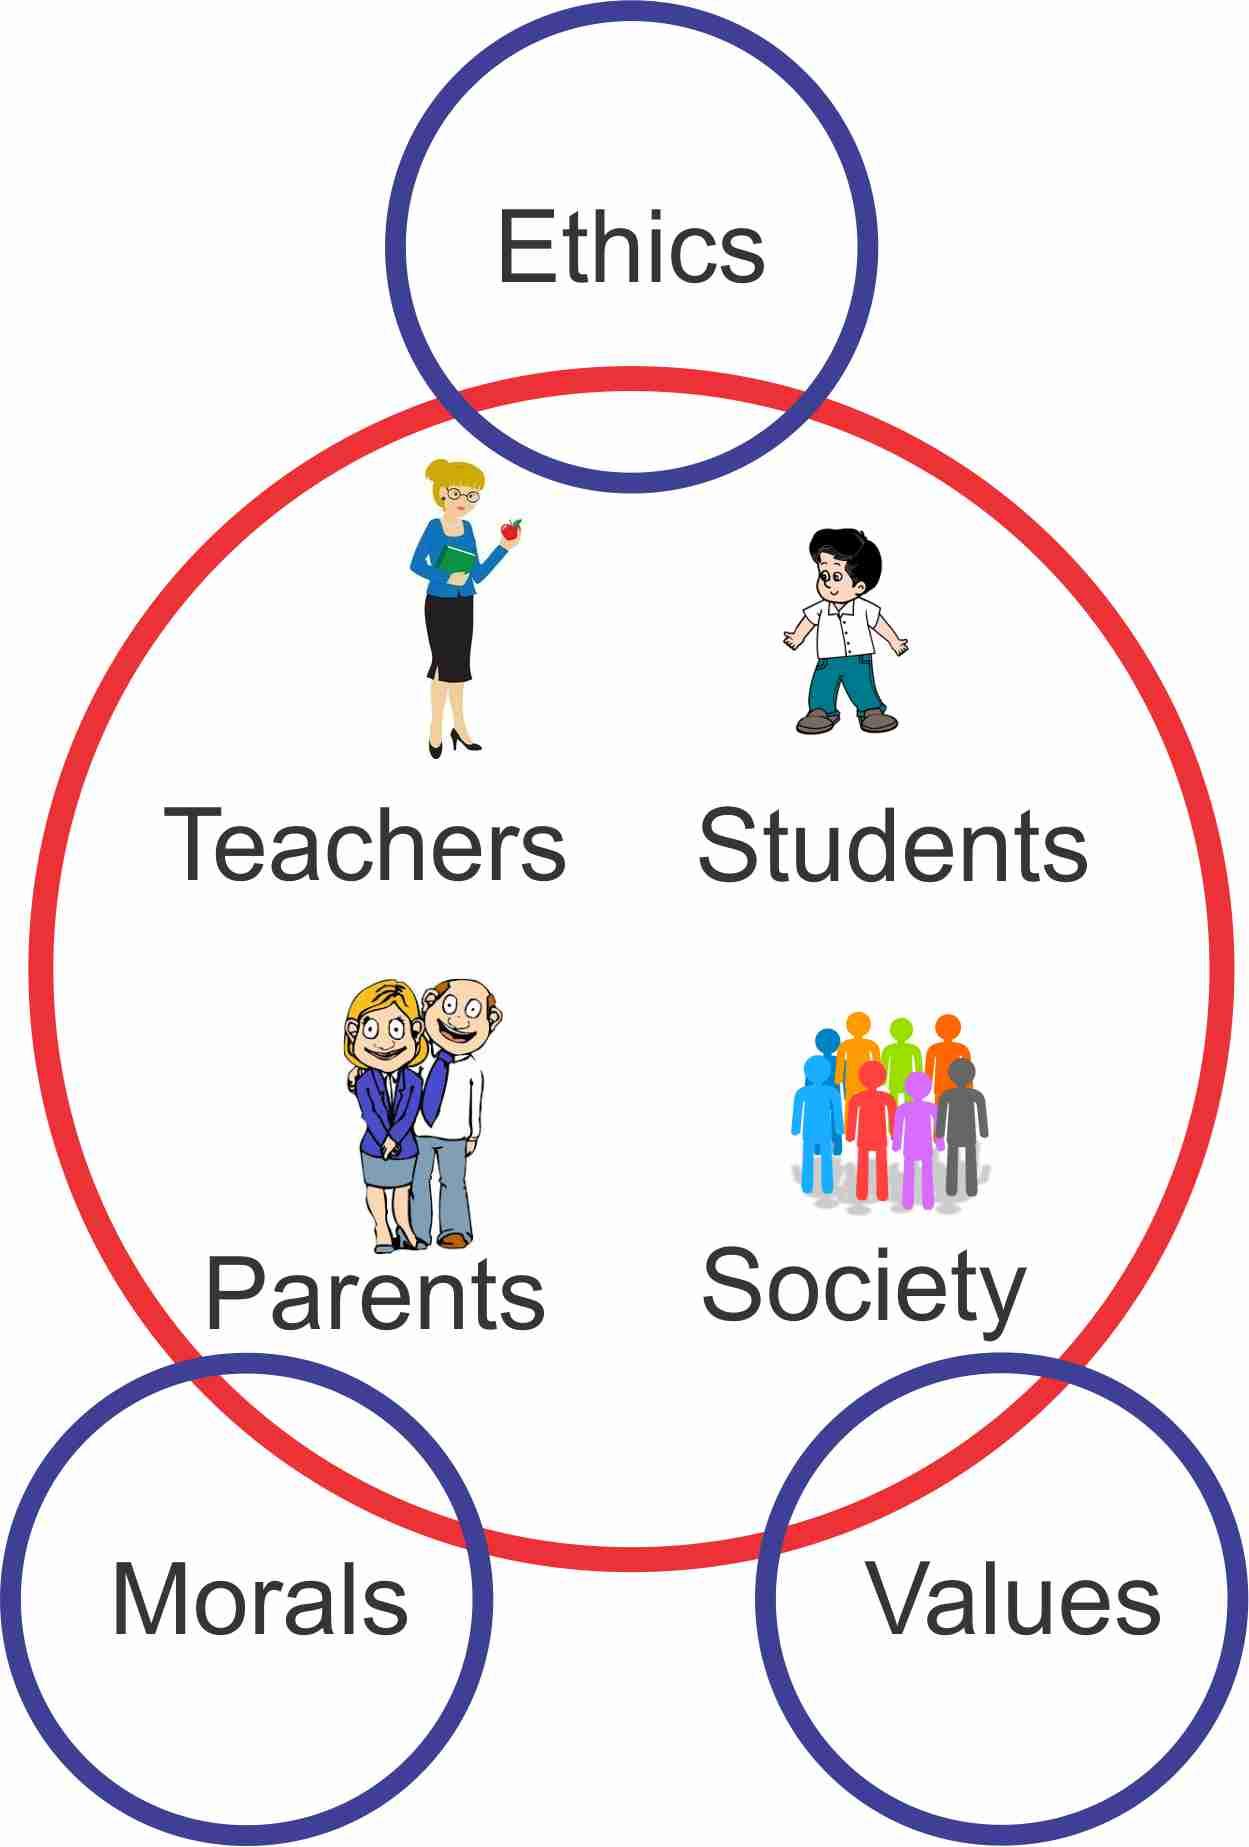 Ethical issues in Education | Saraswati World School